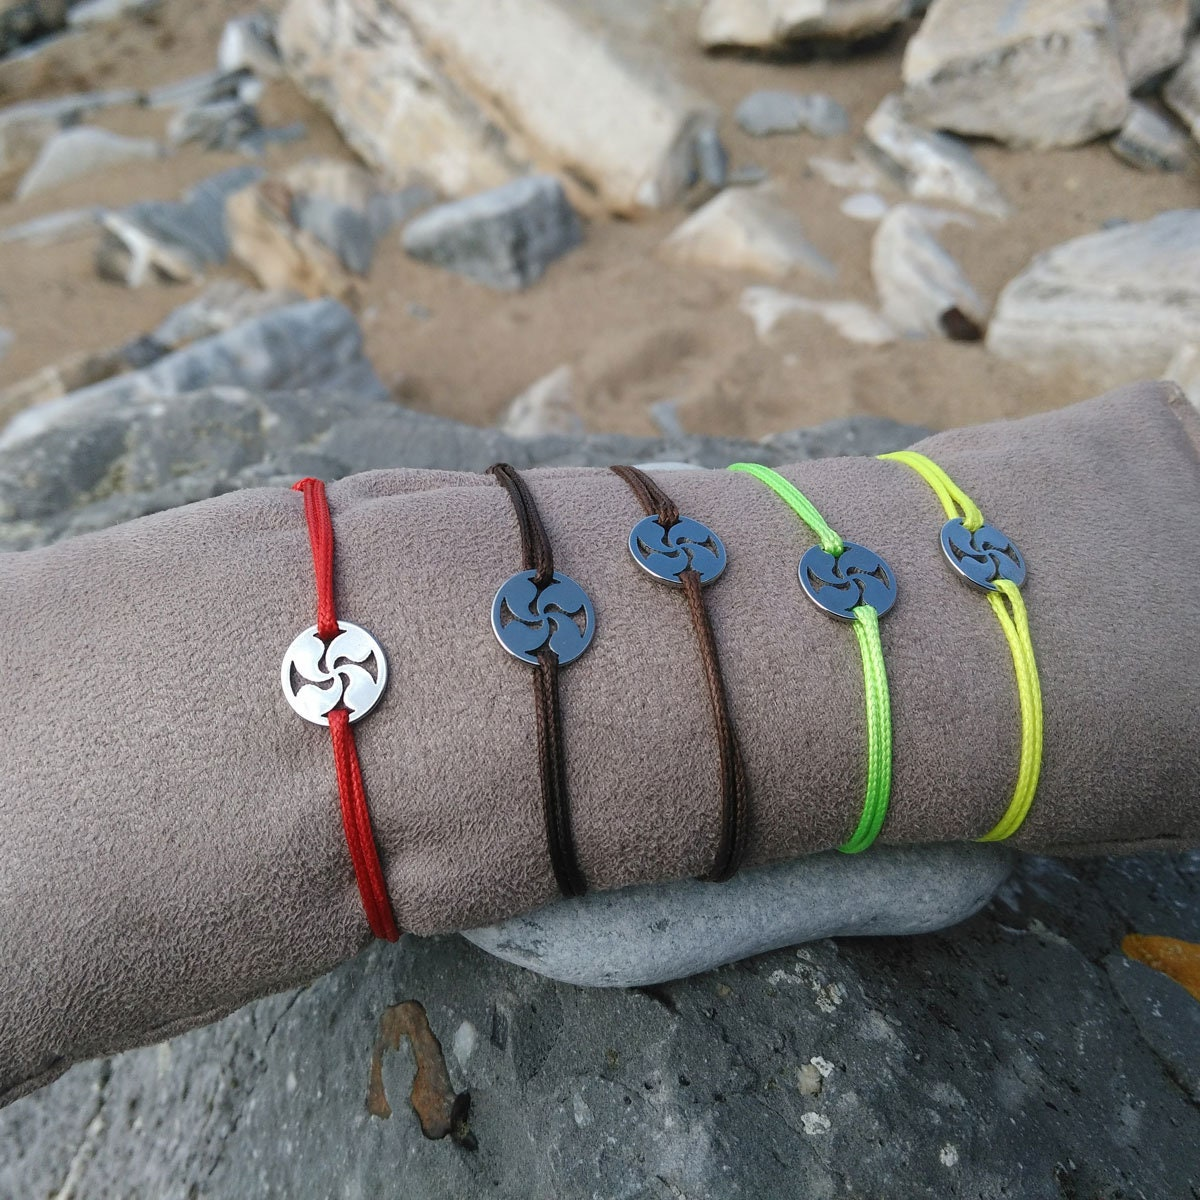 Made On Terra Basque Cross Lauburu Euro European Italian Style Bracelet Bead Sqr Charm